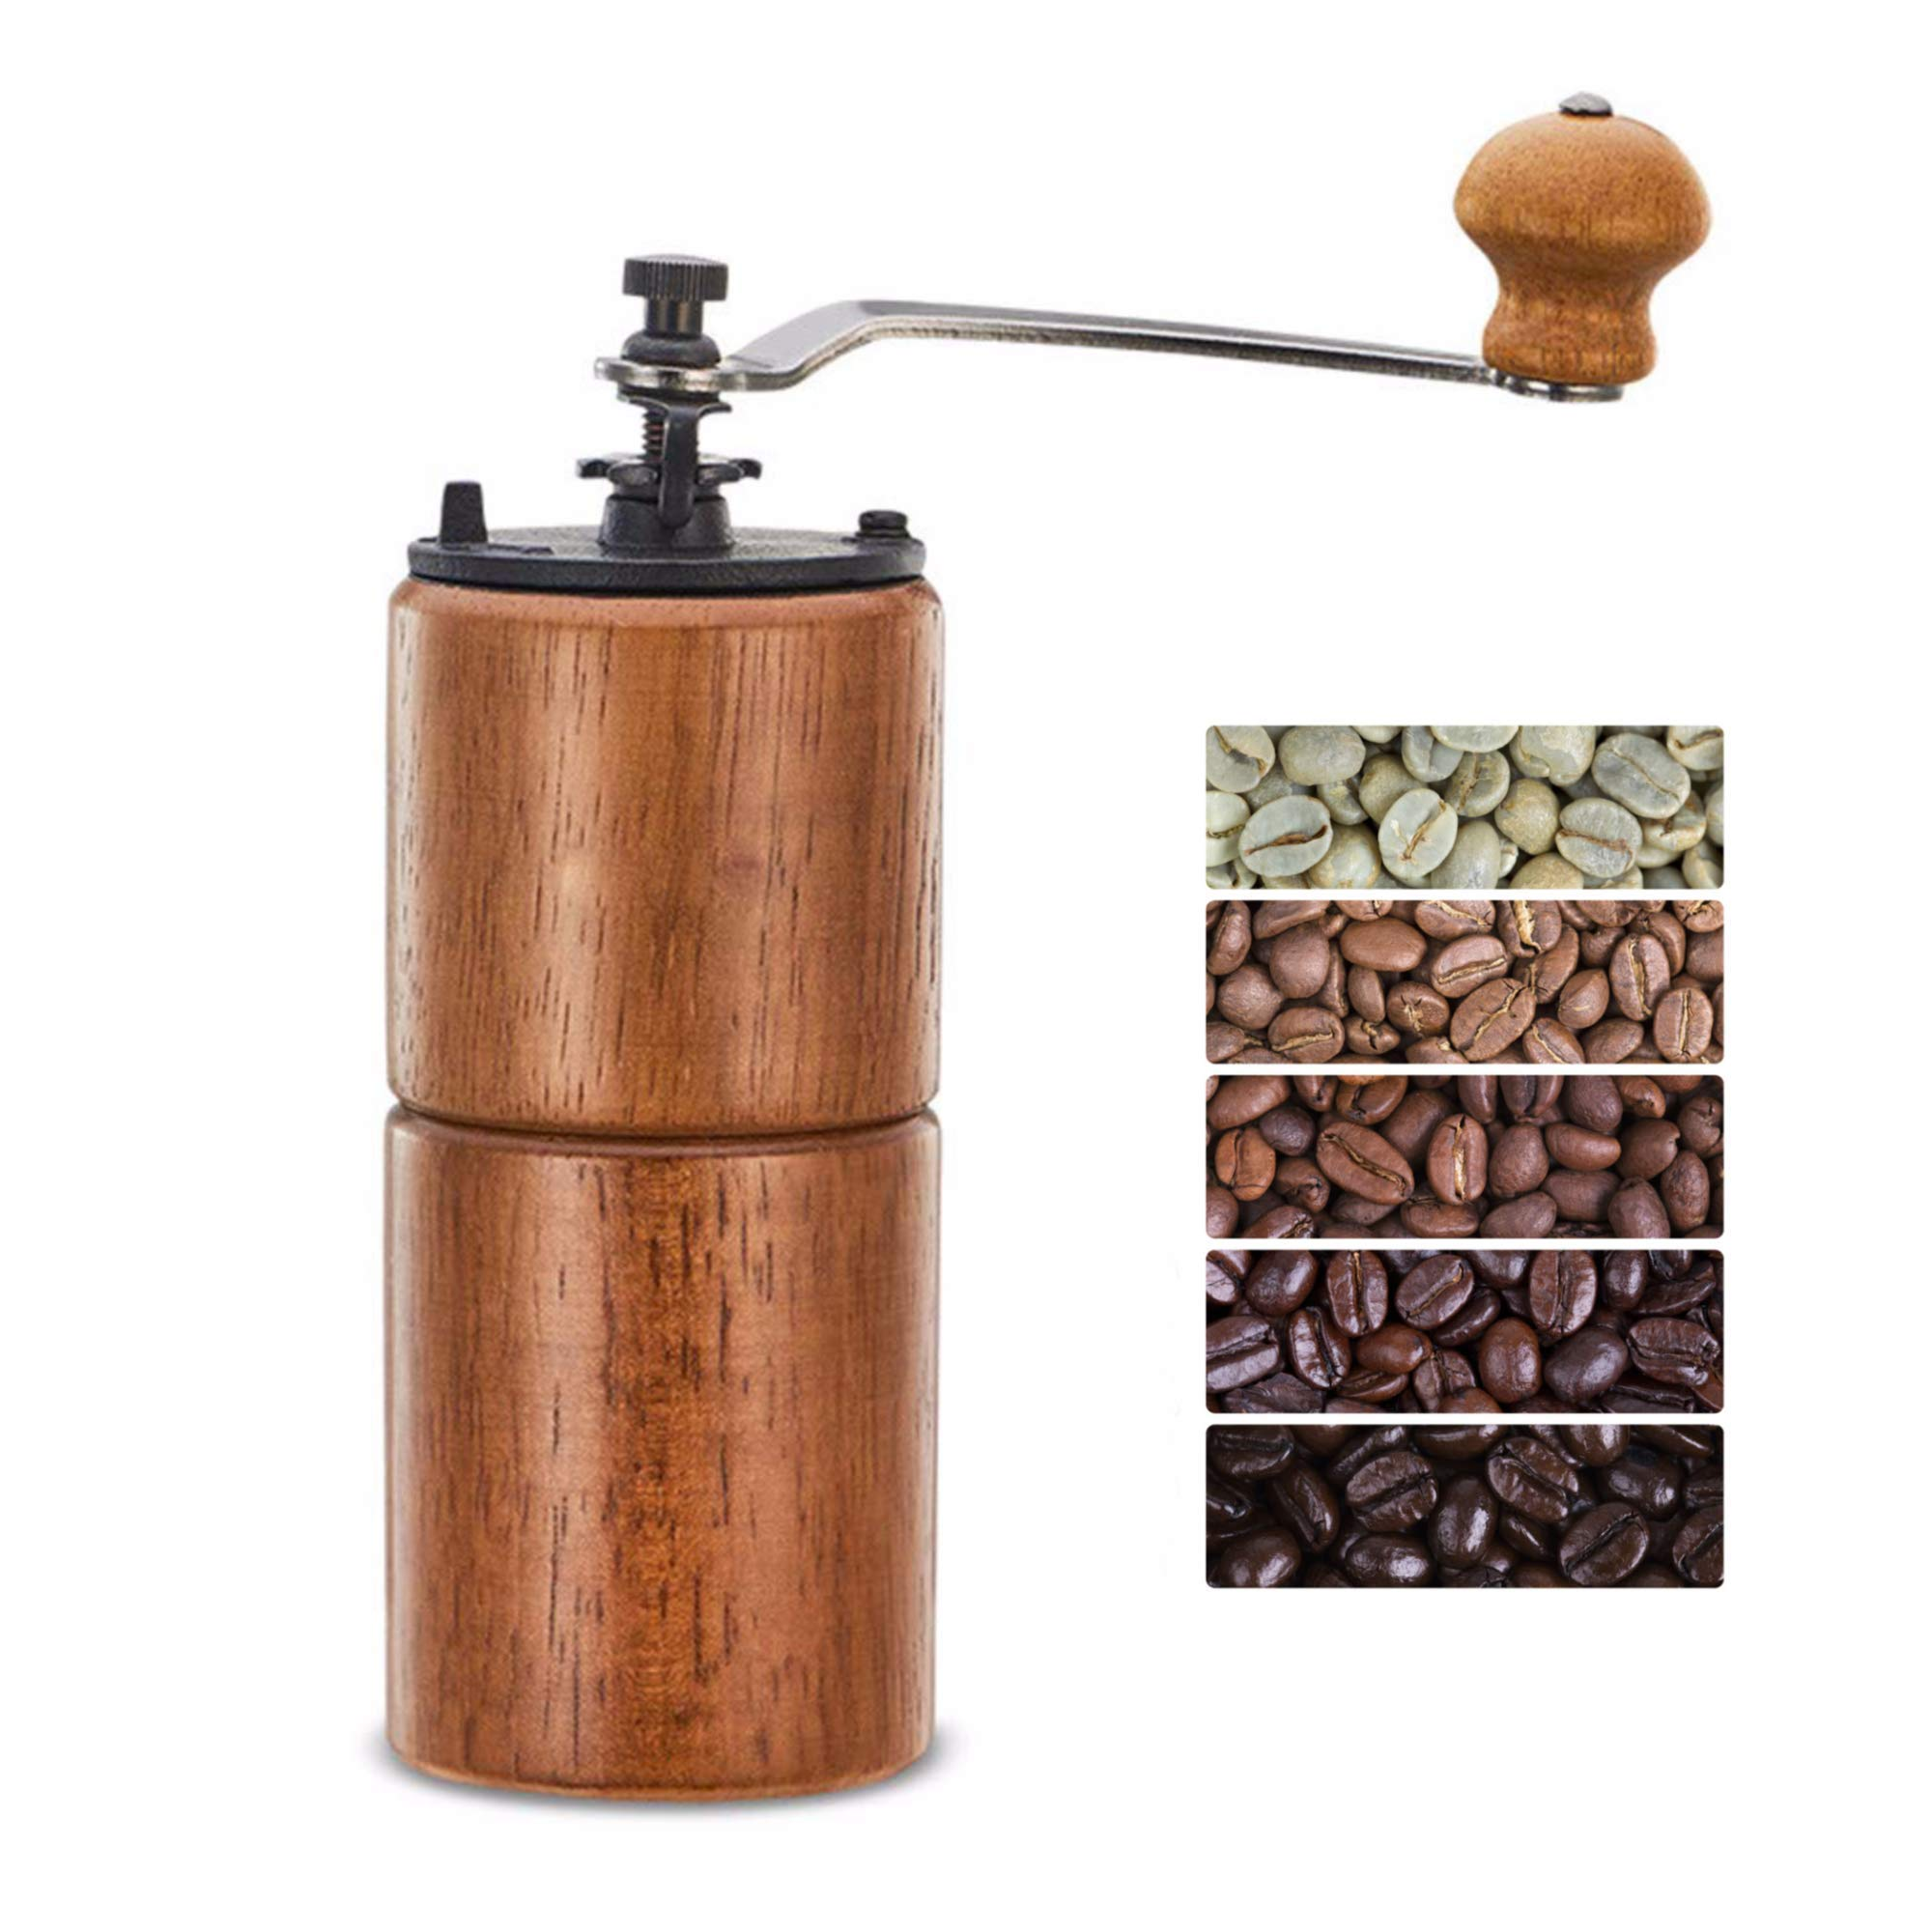 Fumao Hand Coffee Grinder Wooden Coffee Mill with Ceramic Burr, Large Capacity Dark Wood, Cast Iron Manual Crank, Portable Adjustable (Dark wood) by Fumao